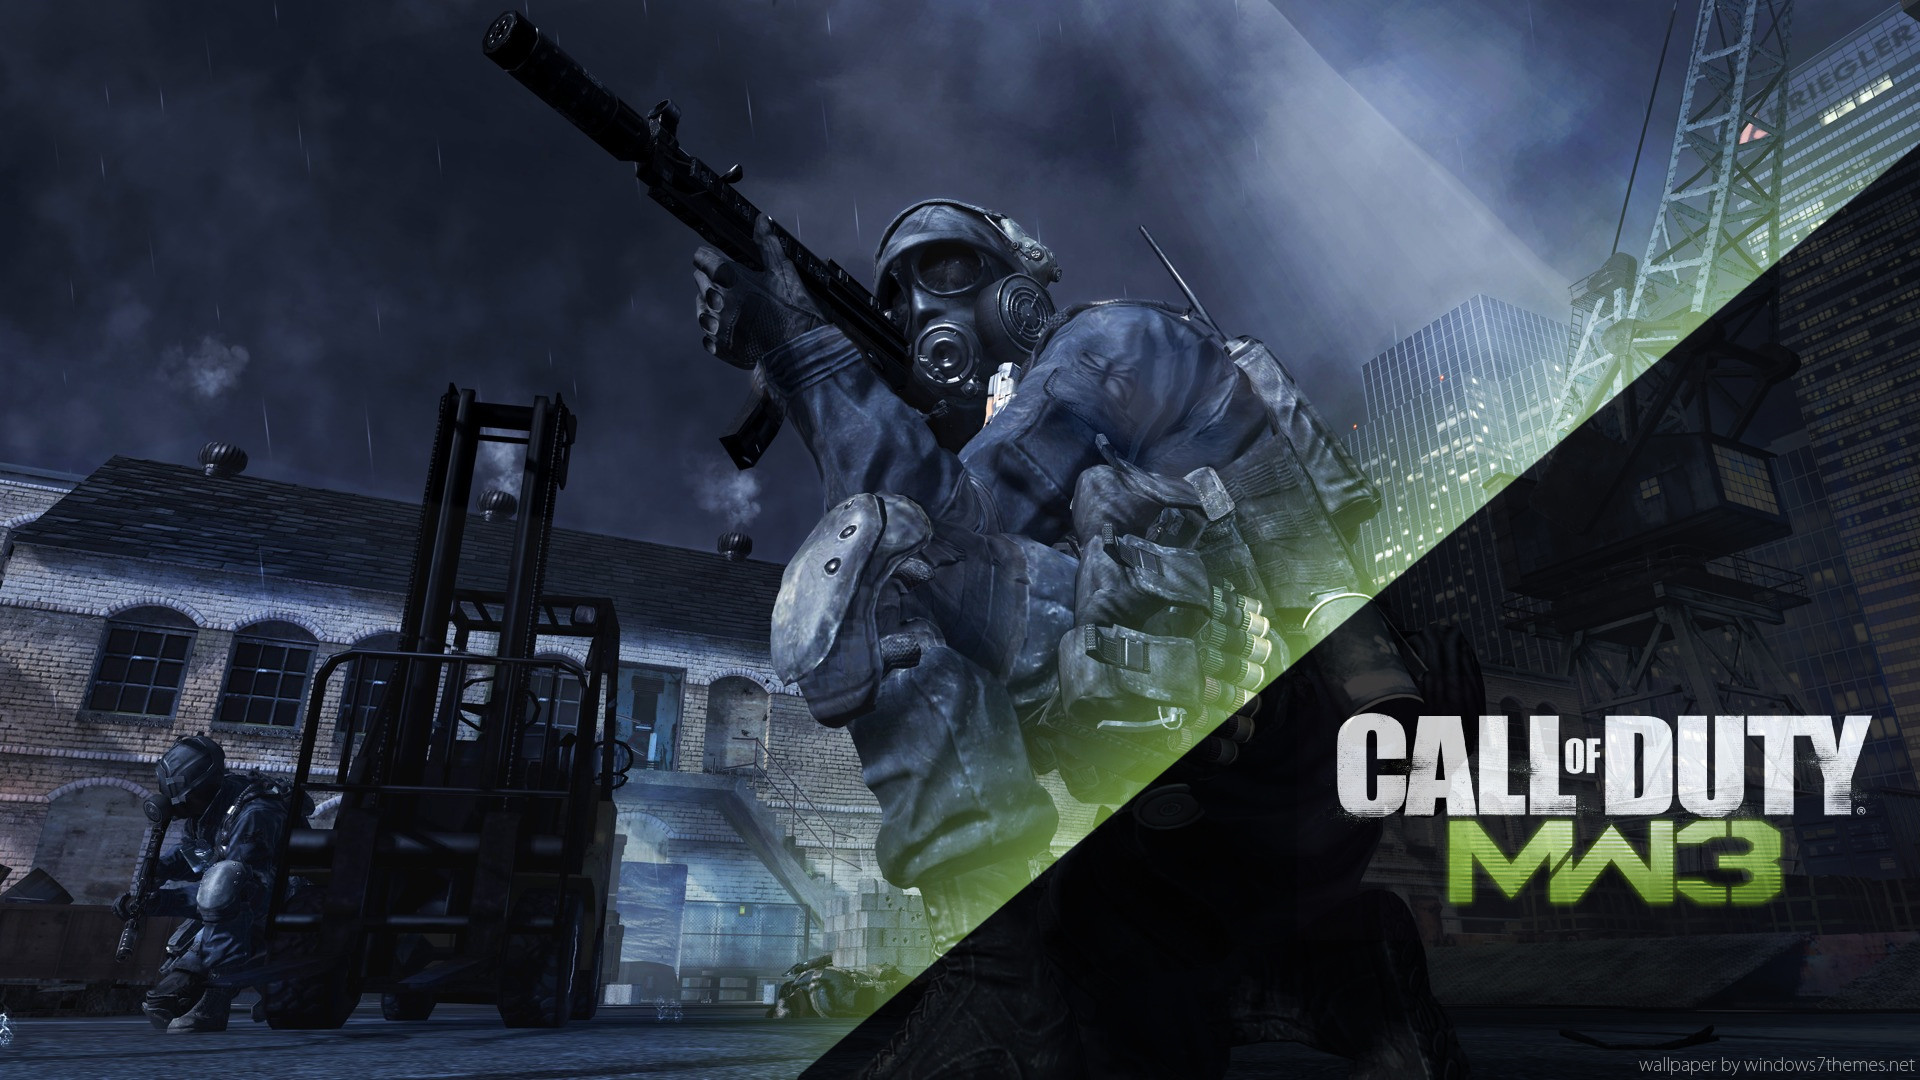 Call of Duty Modern Warfare 3 HD Wallpaper 2 Small